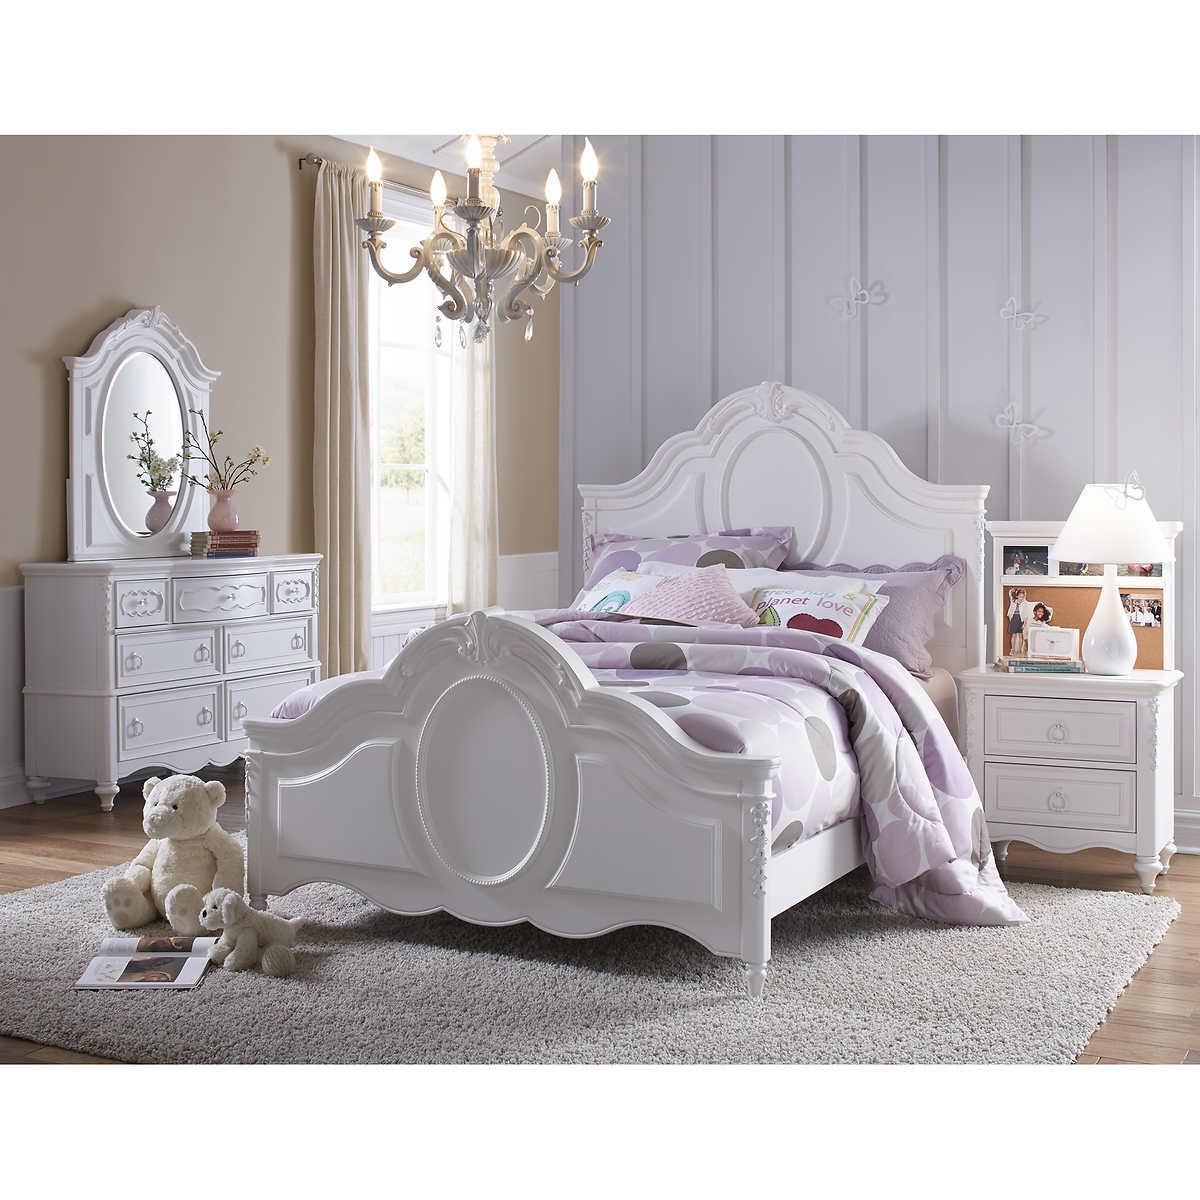 Bedroom Sets Twin twin bedroom sets | costco